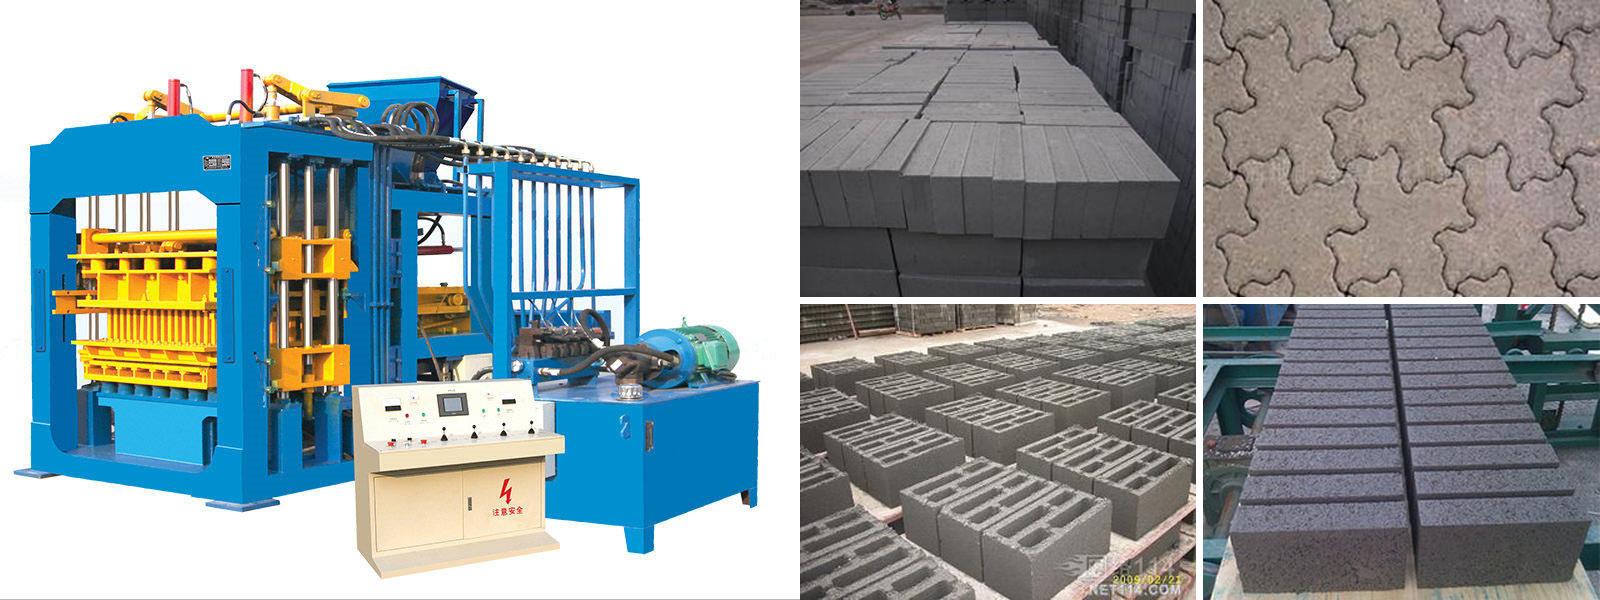 ABM-8S concrete block making machines